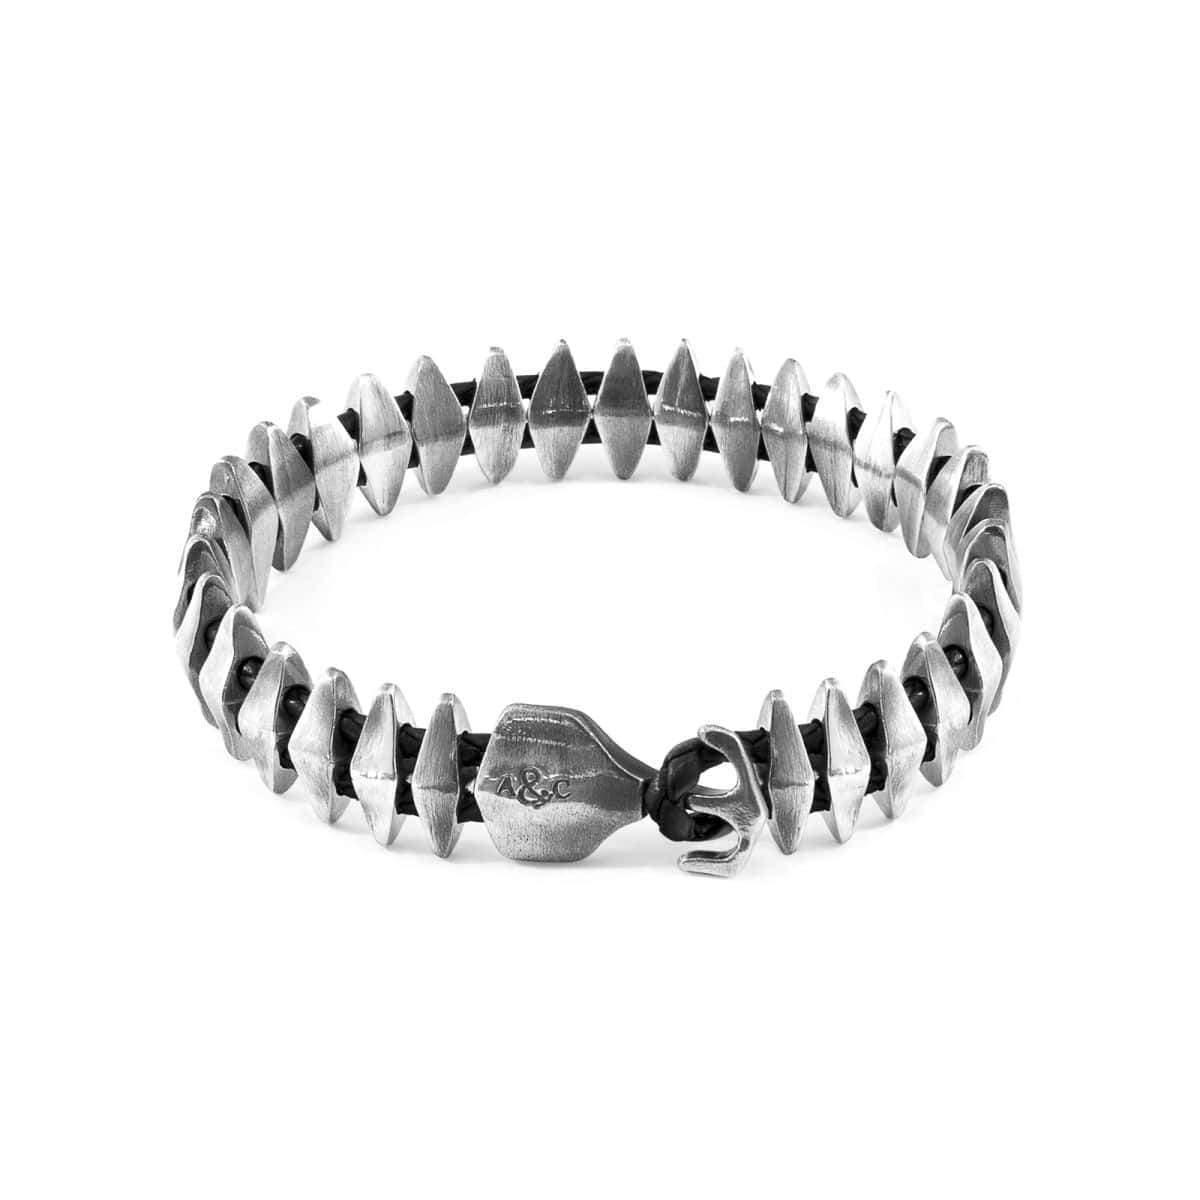 Anchor & Crew Black Delta Anchor Silver & Braided Leather Bracelet JuGu3